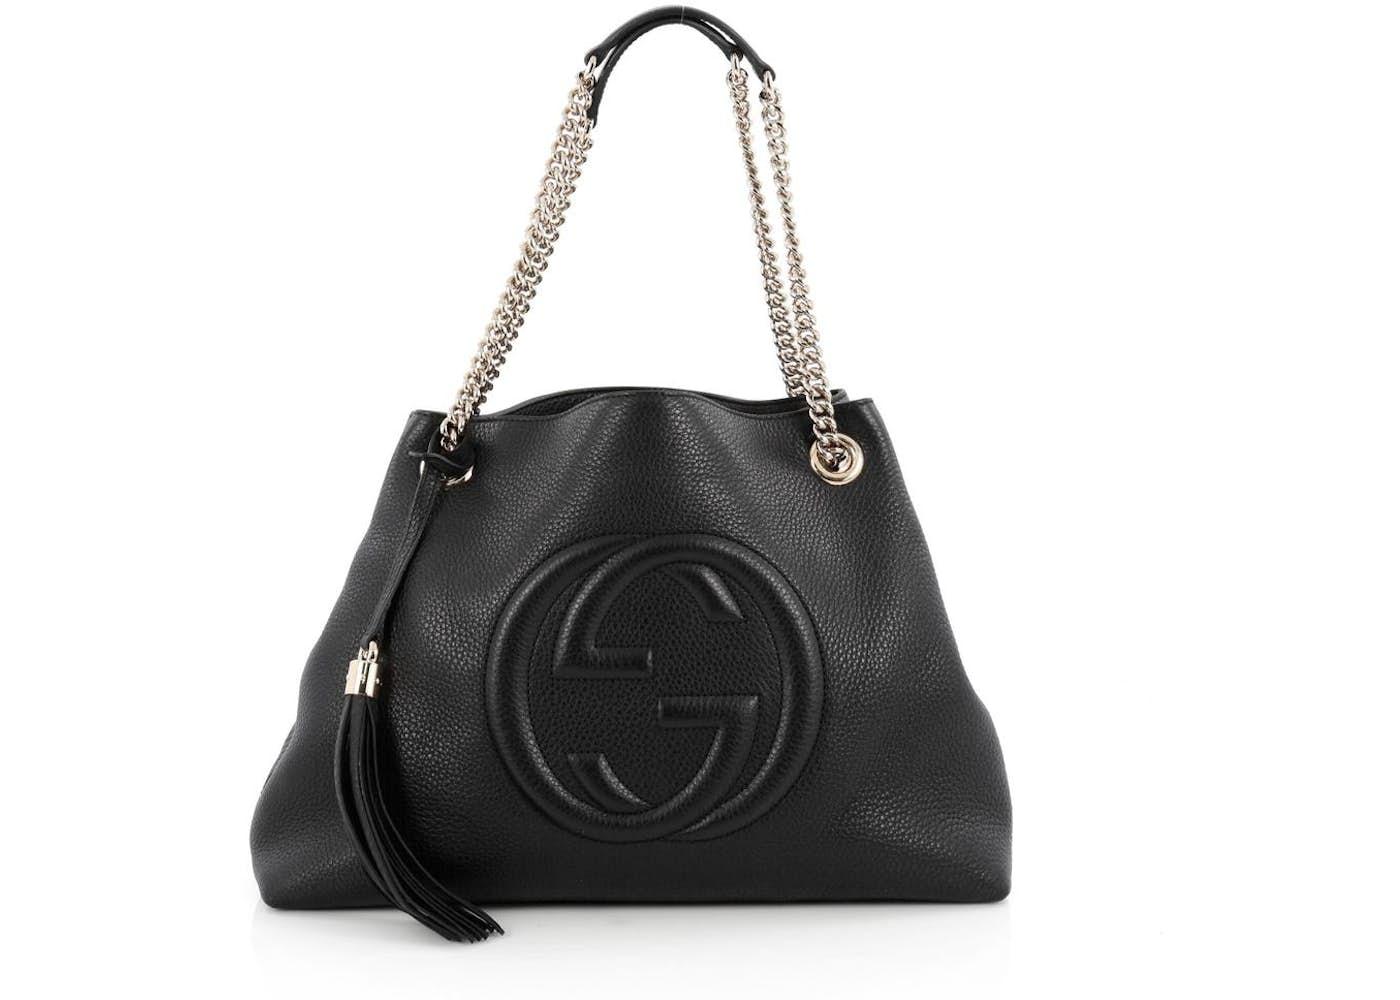 9682b1948749 Gucci Soho Medium Shoulder Bag Reviews | Stanford Center for ...